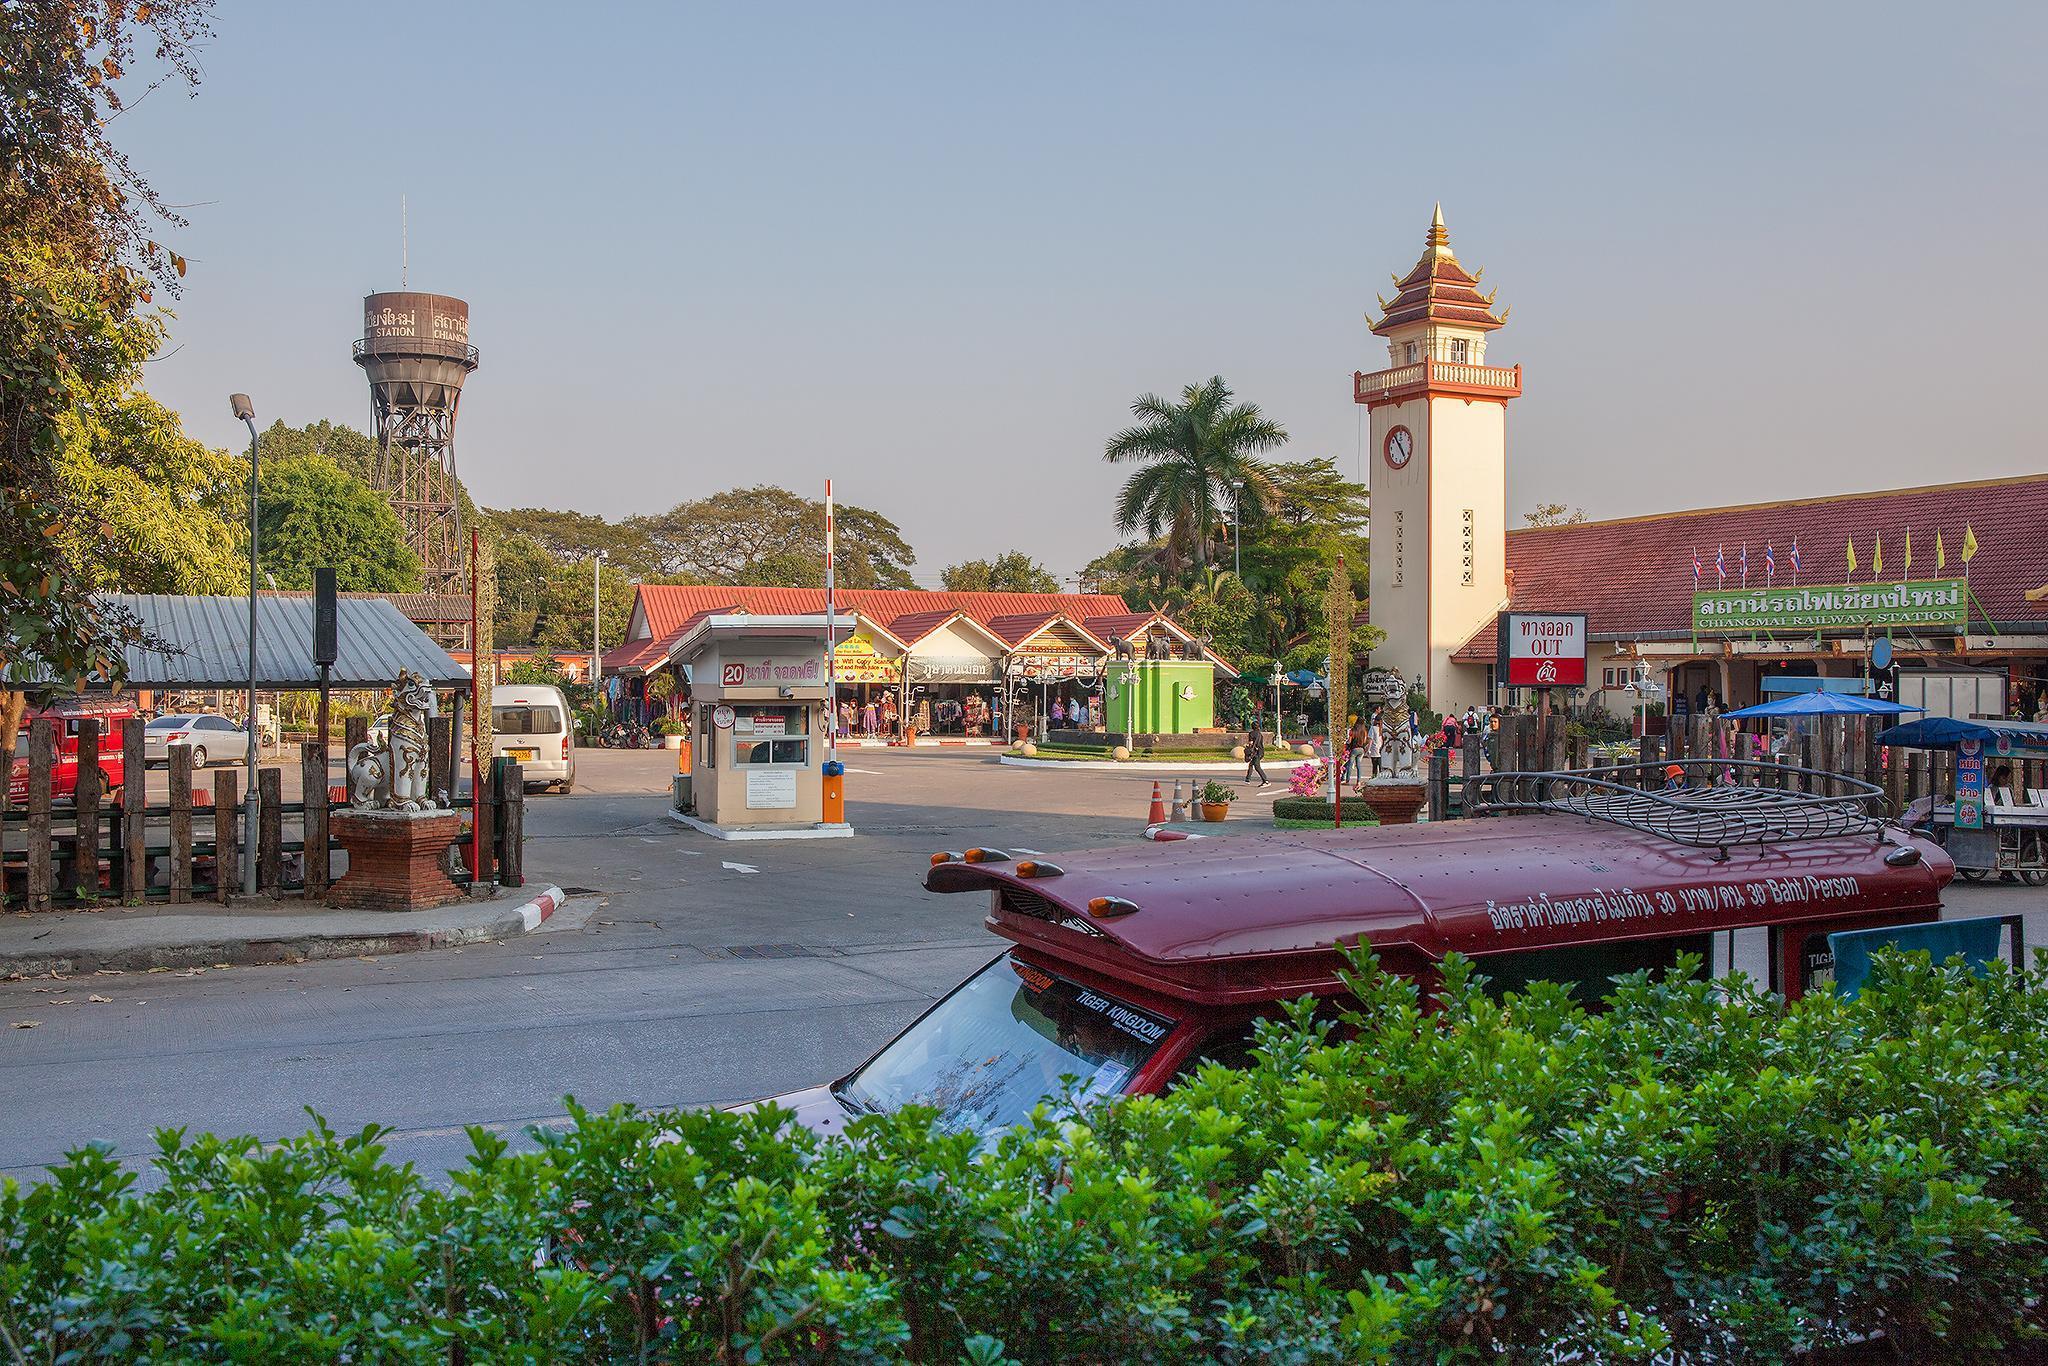 Modern 26 Sqm Bossotel ChiangMai FREE BIKES RENTAL